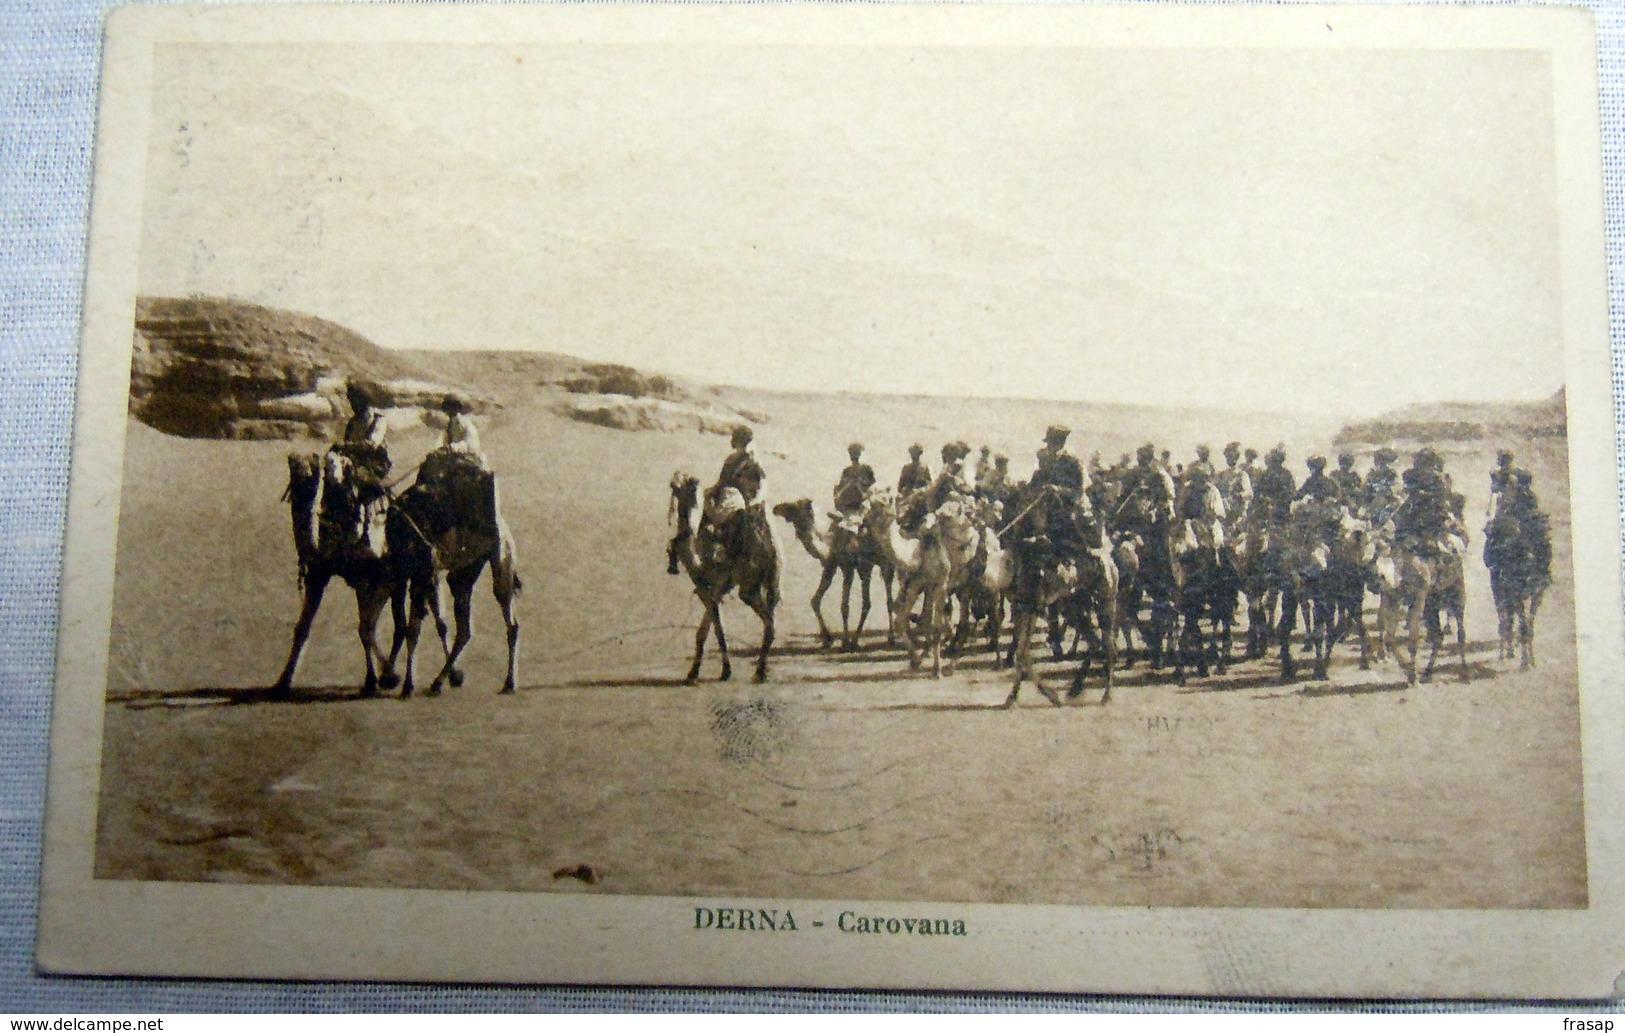 CPA-KP-PC- LIBIA  - COLONIA ITALIANA --  ASCARI DERNA CAROVANA MILITARI - Libia